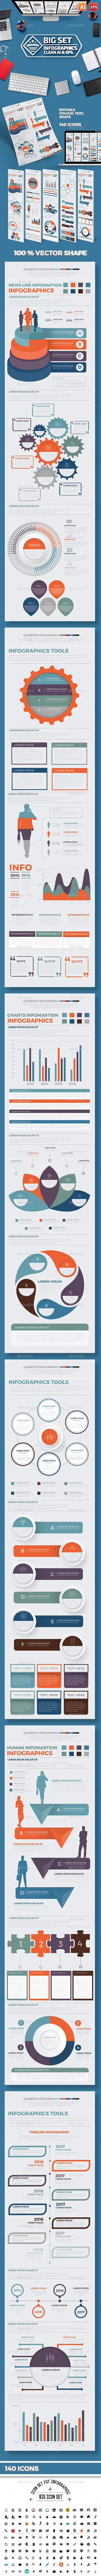 Infographic Set Design - Infographics